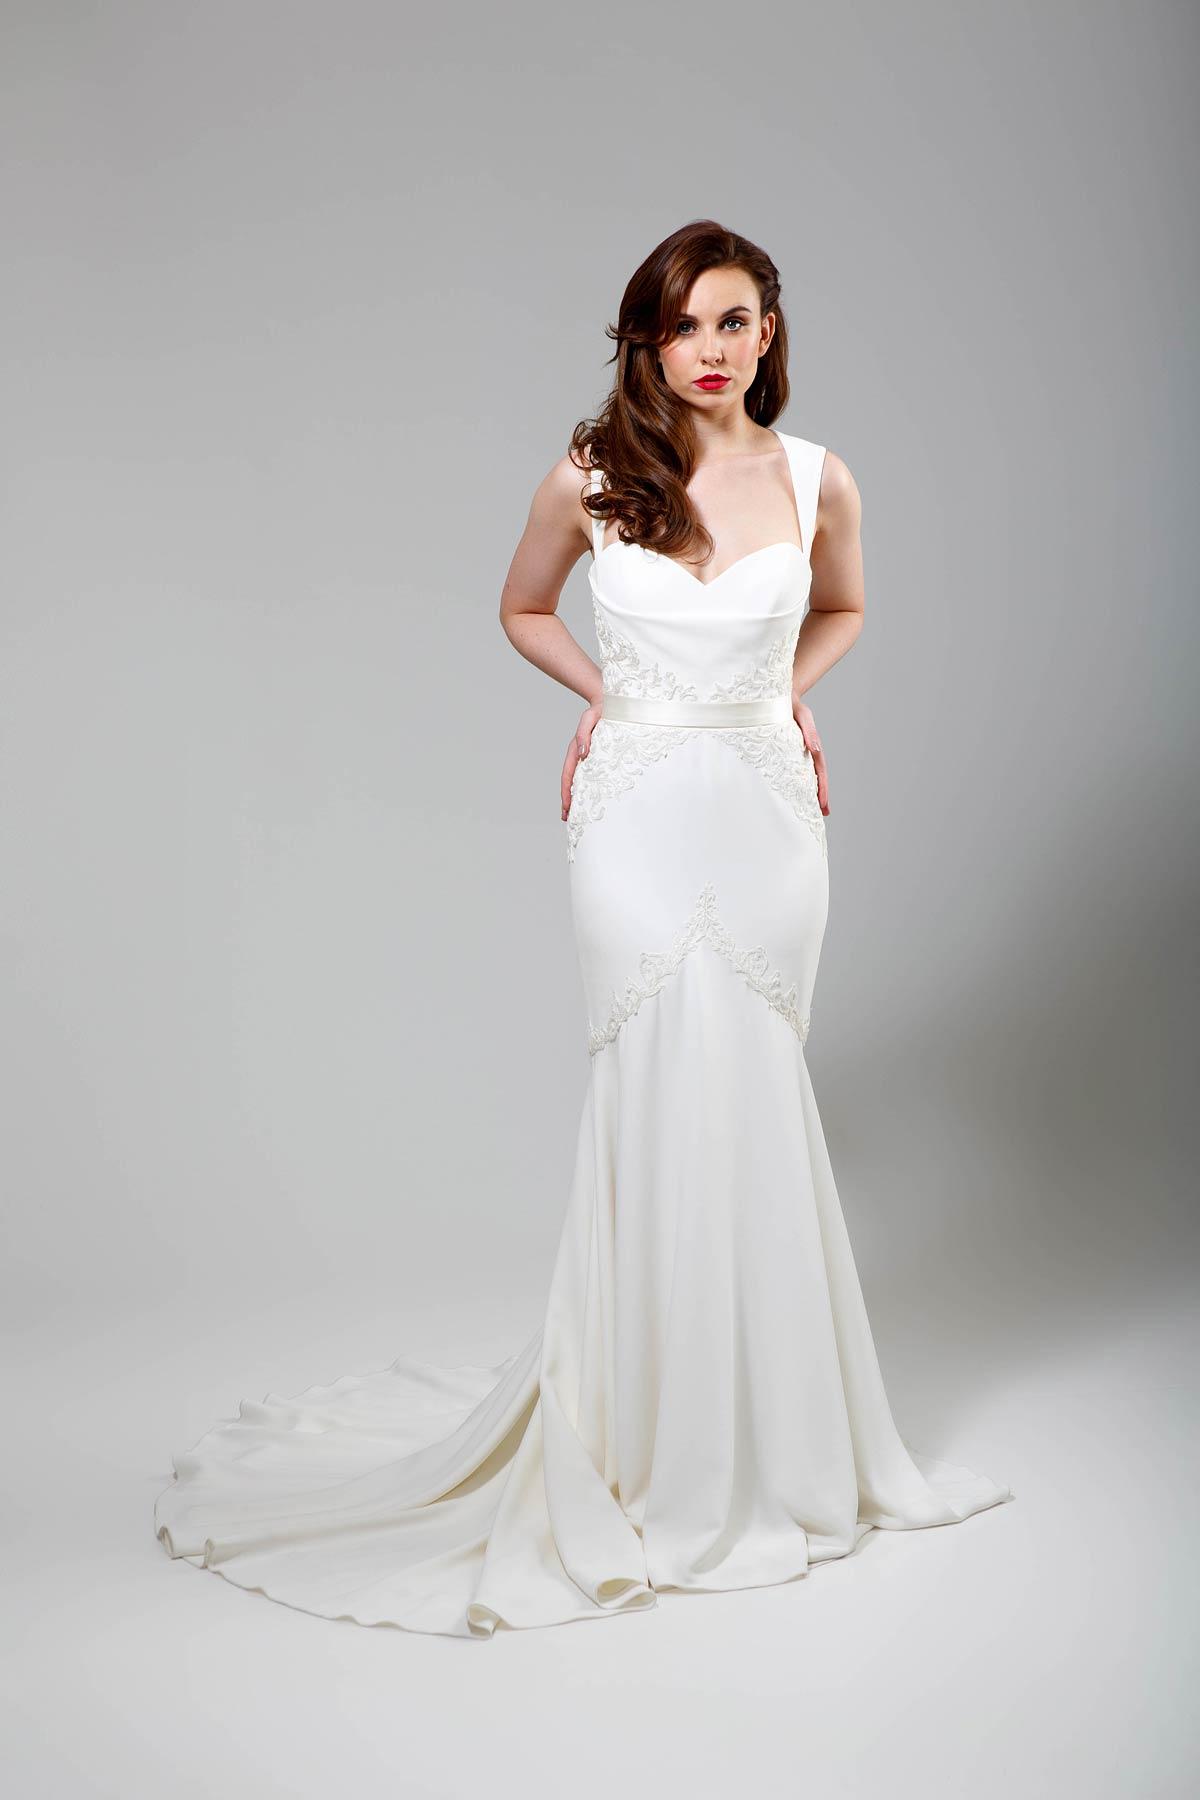 Wedding Hairstyles | Bridal Hairstyles | Bridesmaid Hairstyles